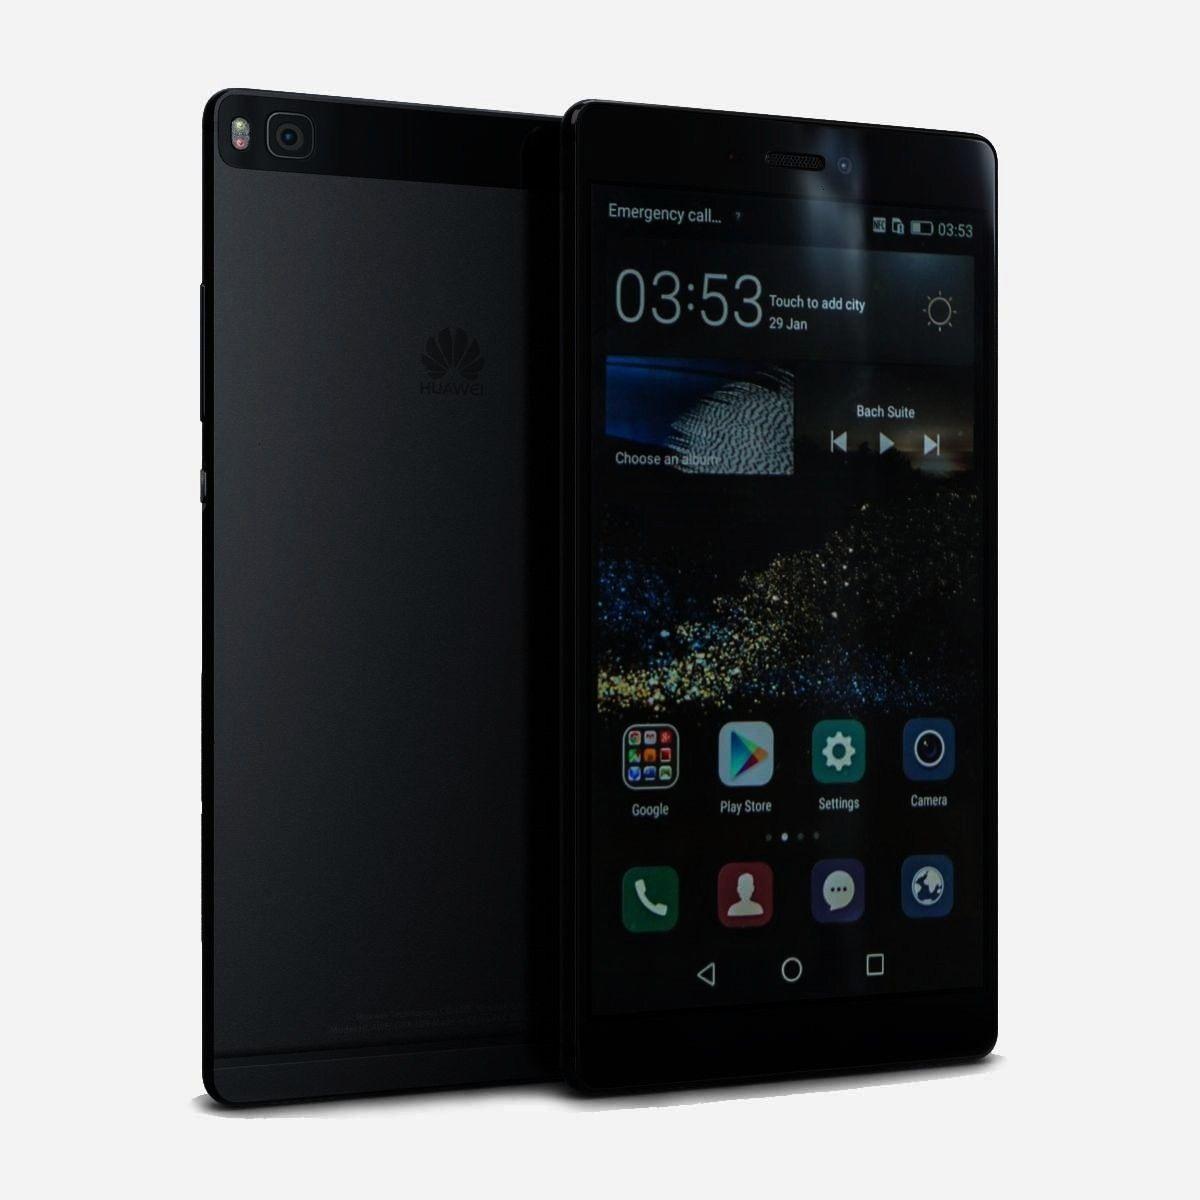 Carbon Black 3D Model ,#Huawei#Carbon#Model#BlackHuawei P8 Carbon Black 3D Model ,#Huawei#Carbon#Mo